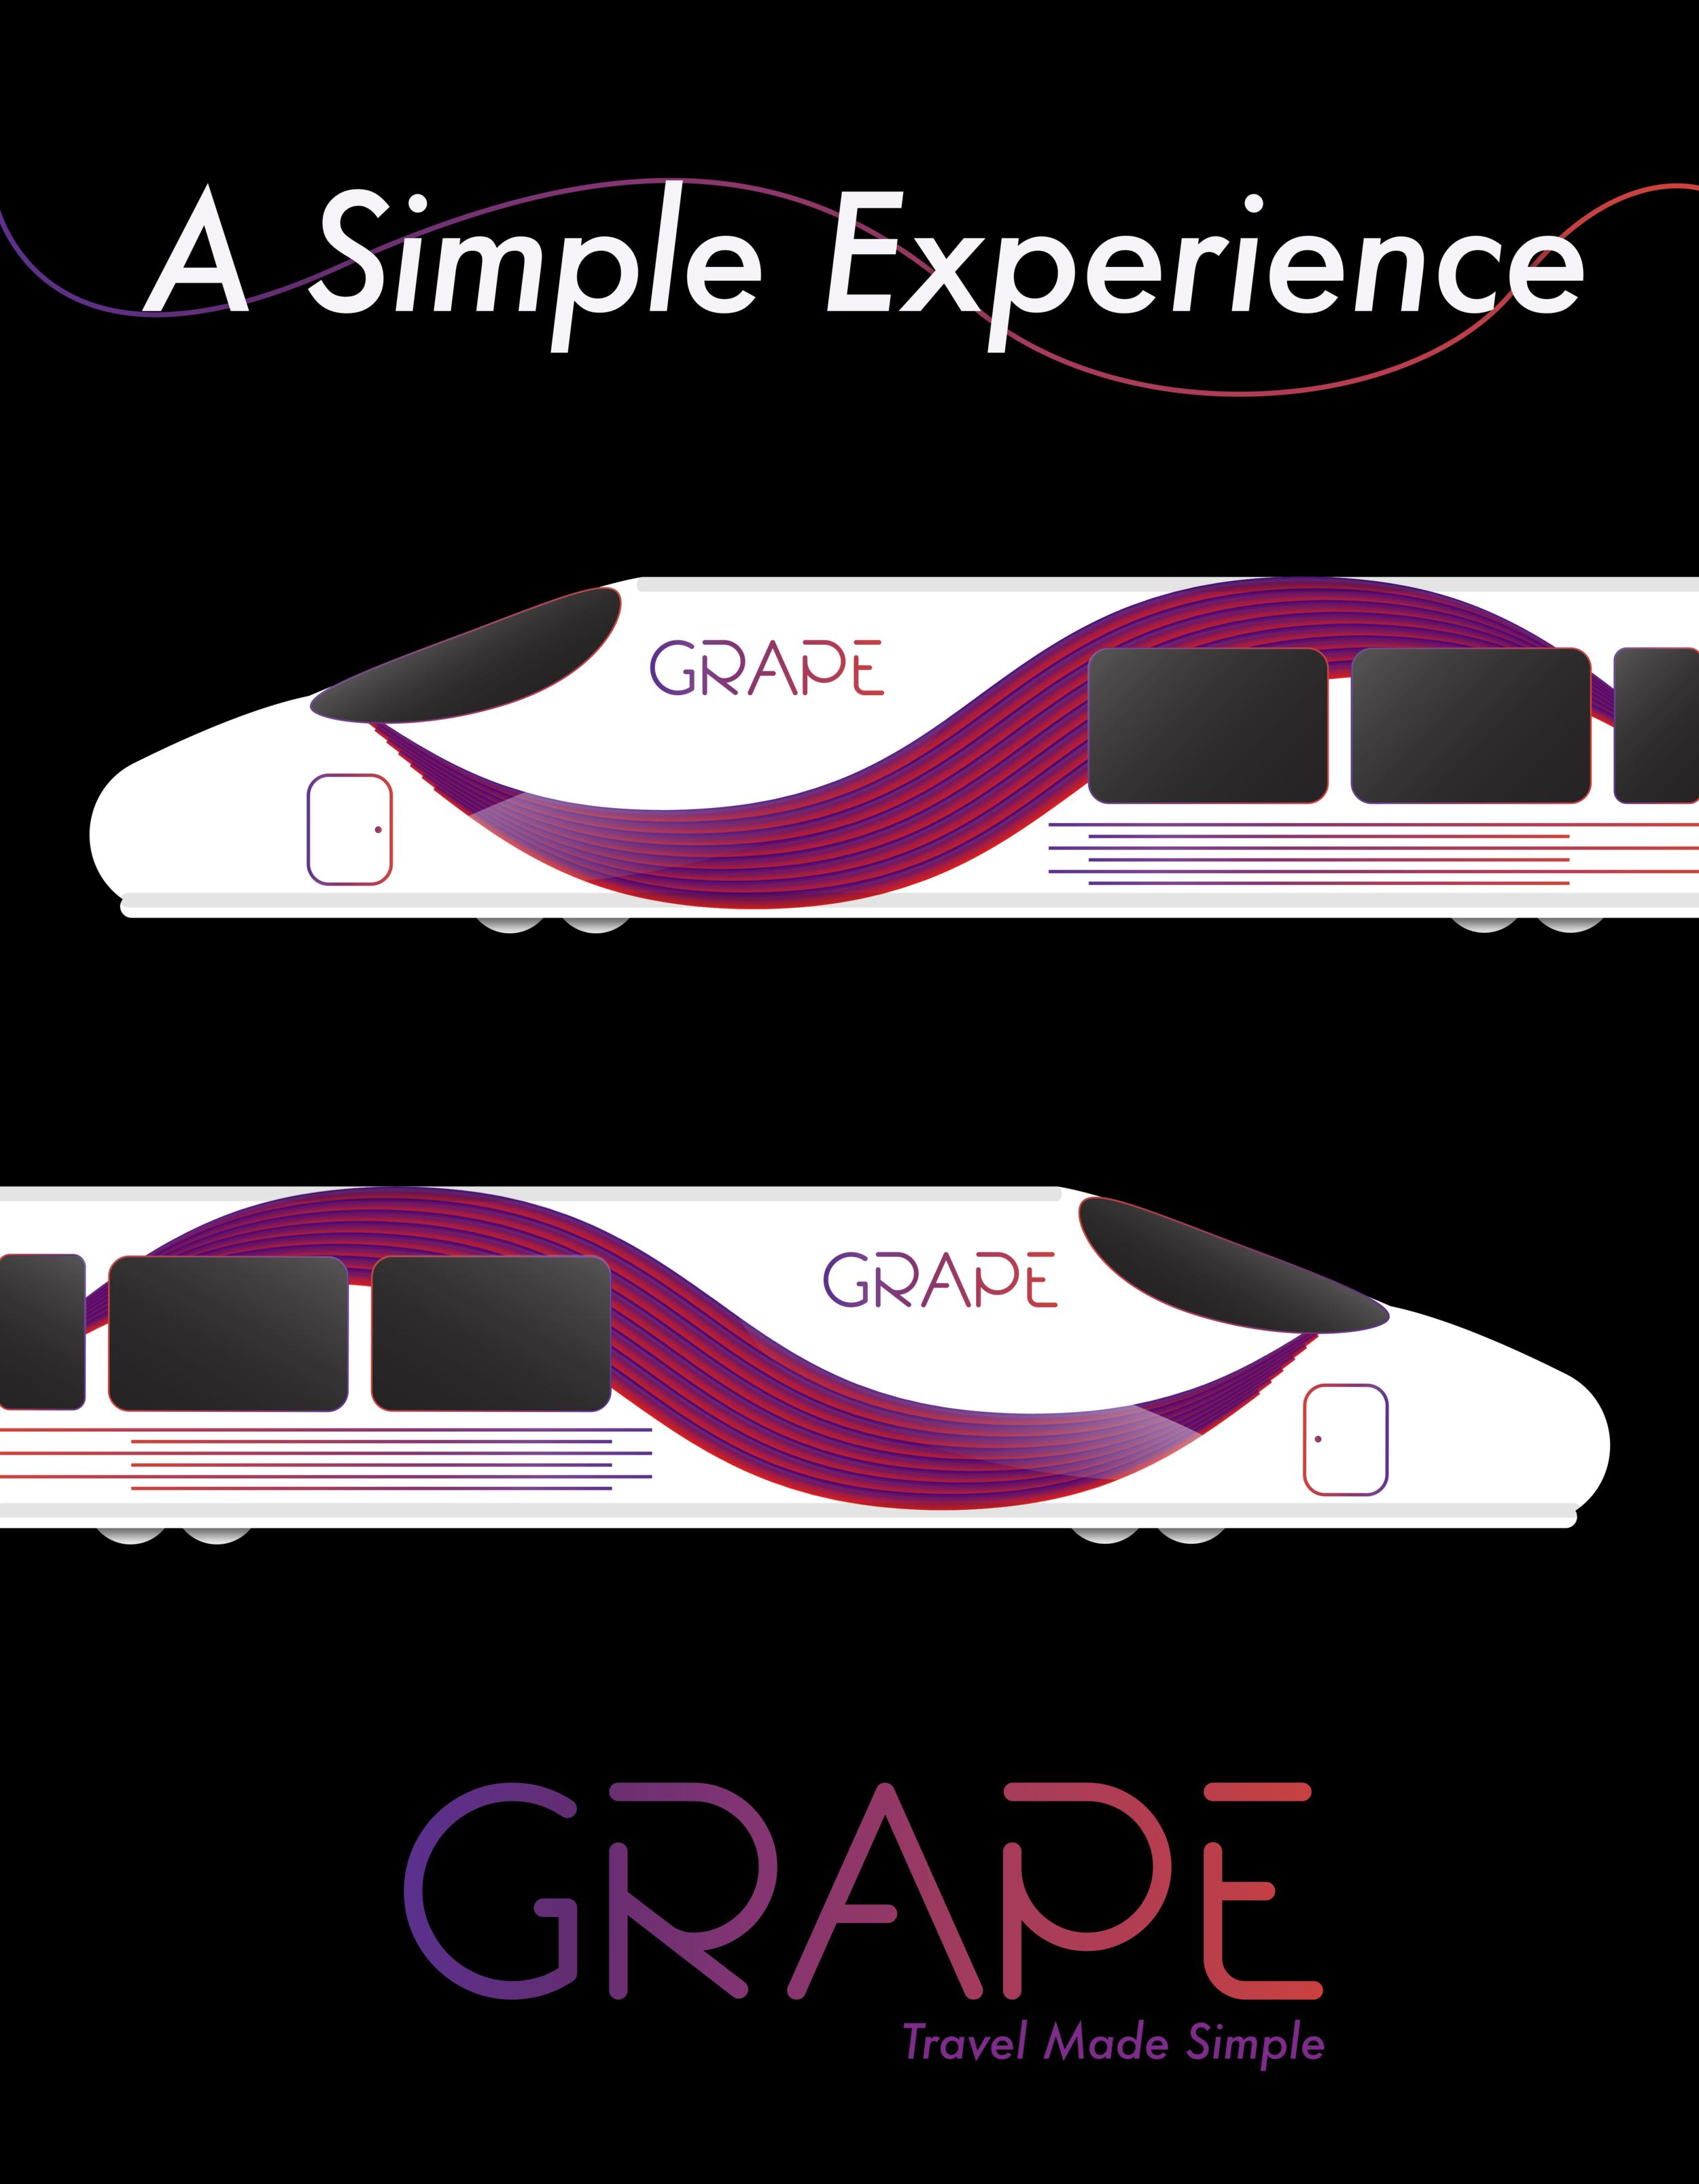 Train_Illustration.png